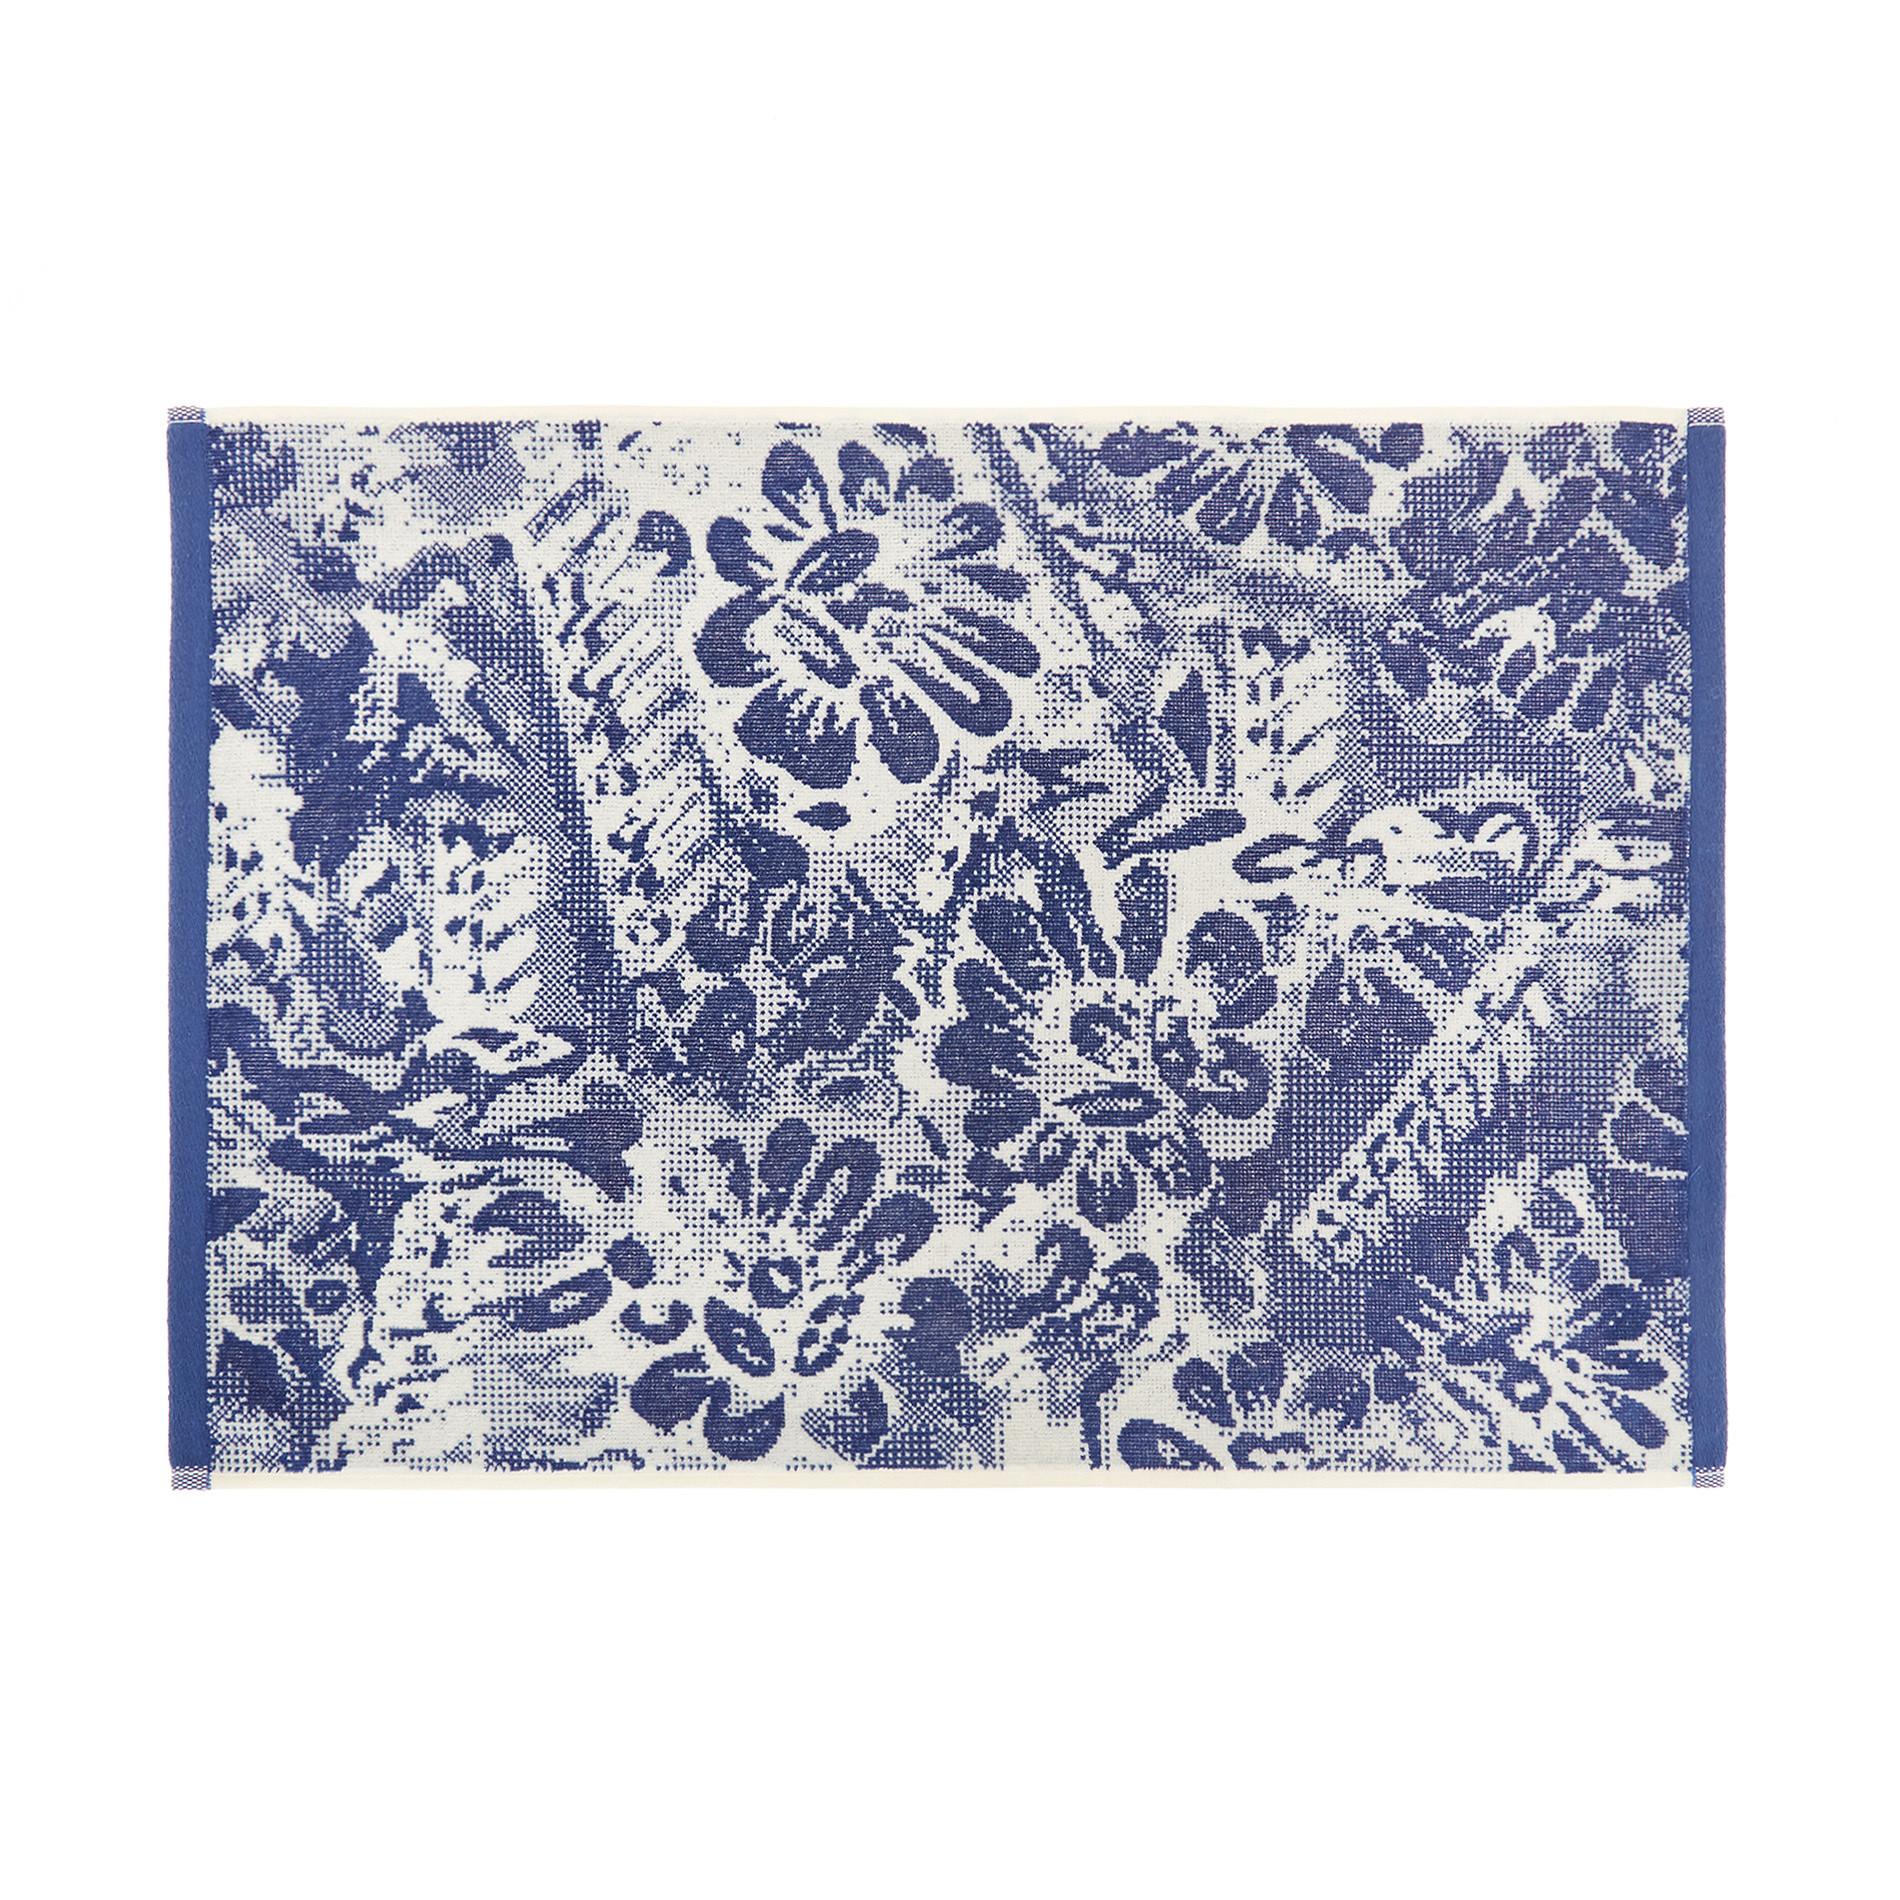 Asciugamano cotone velour motivo floreale, Blu, large image number 1